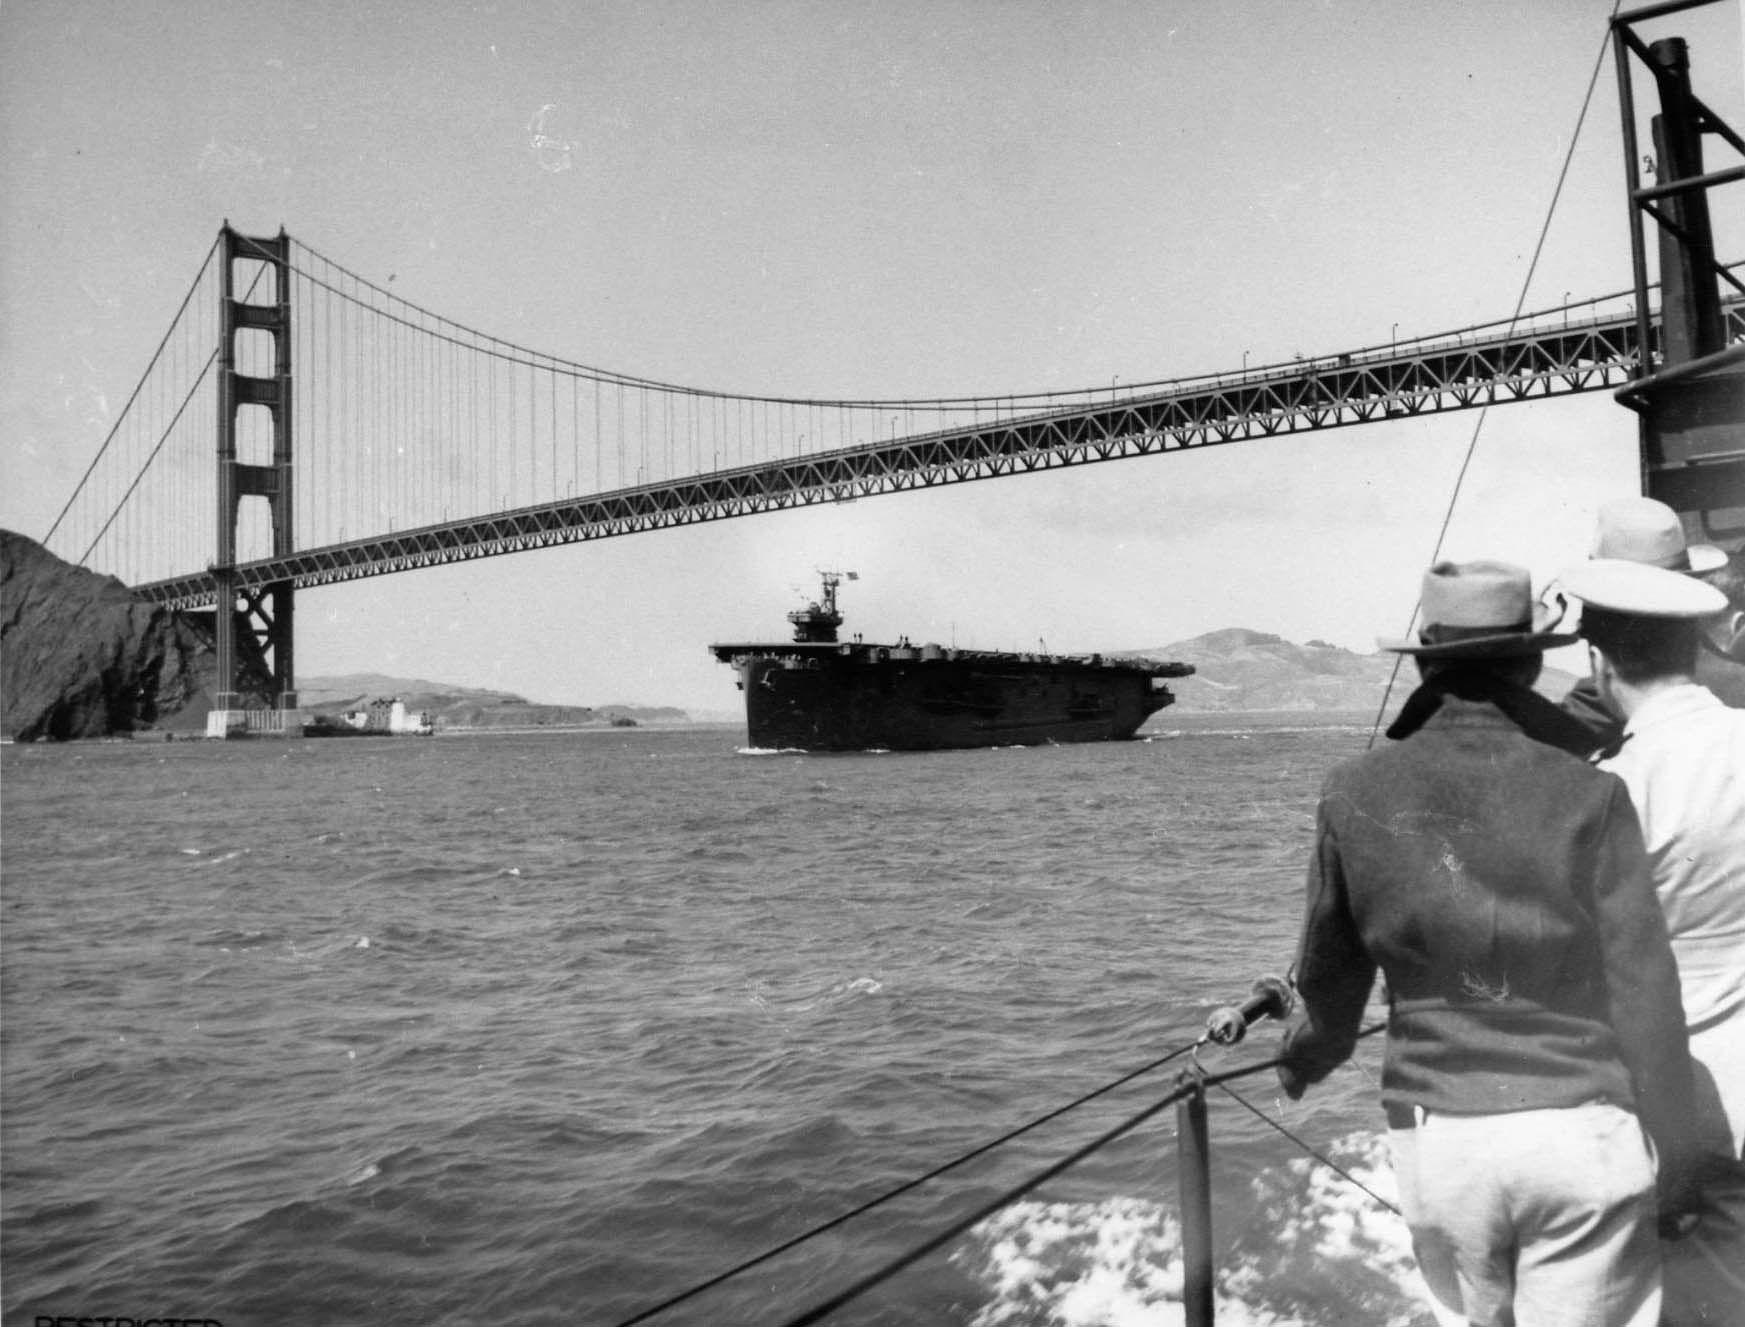 USS Copahee passing under the Golden Gate Bridge, San Francisco Bay, California, United States, 15 Jul 1943